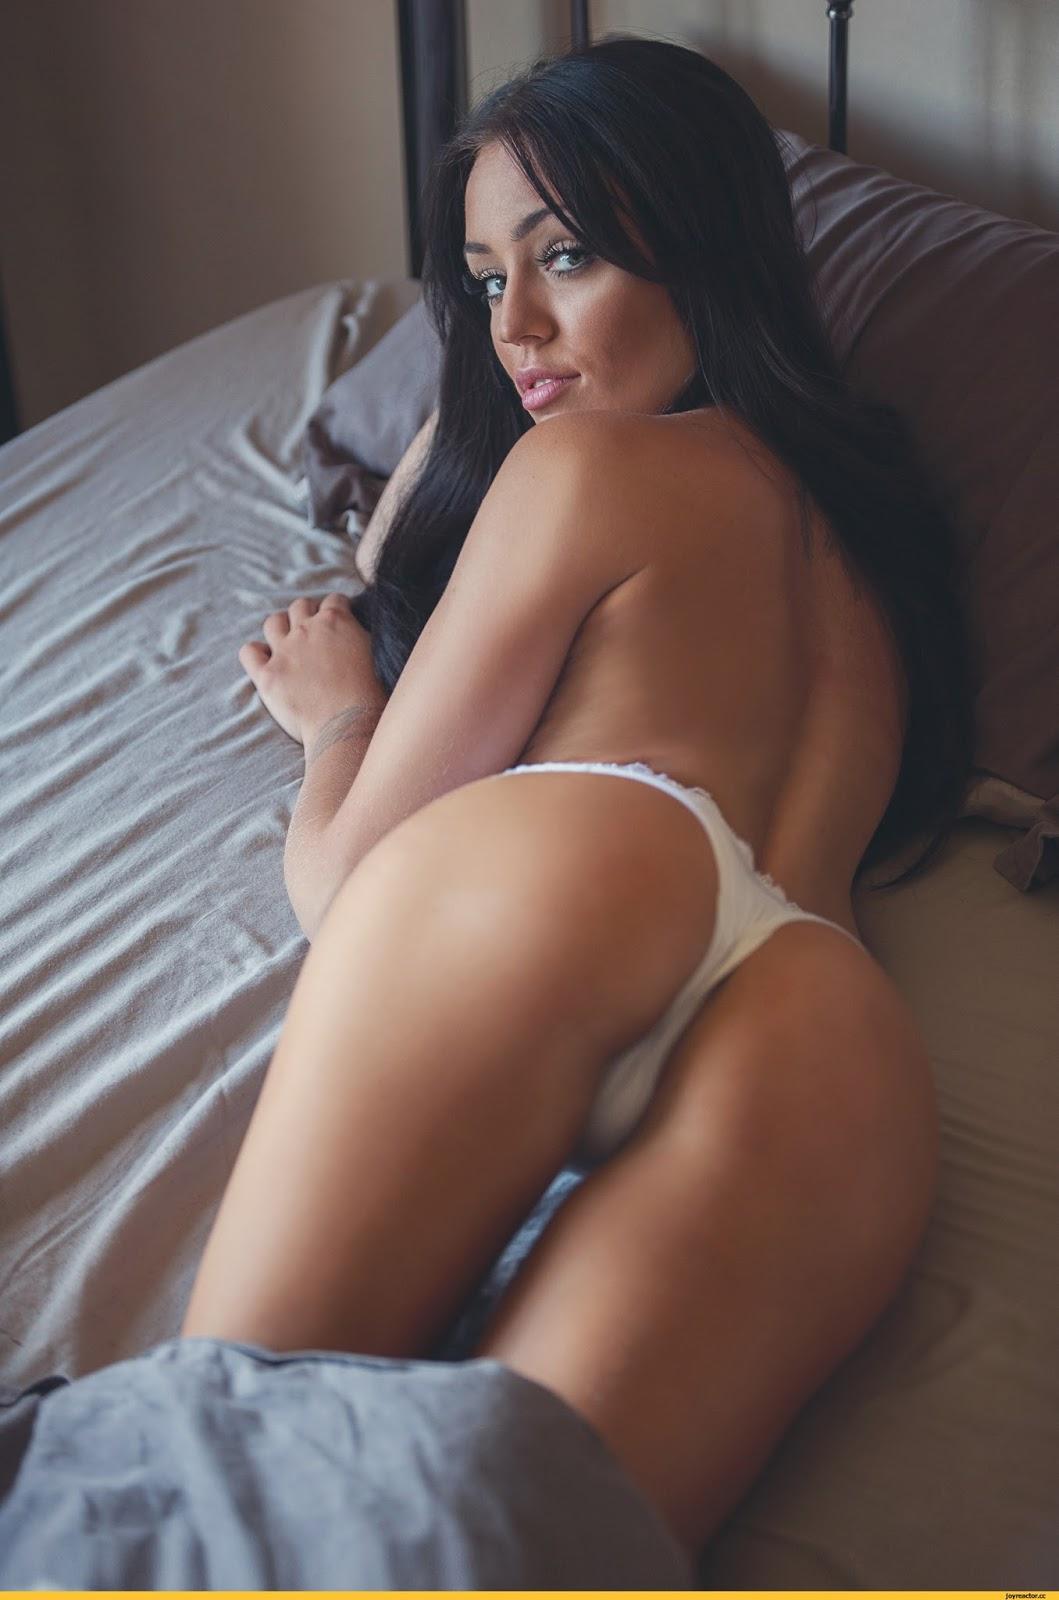 Шоу стриптиз на грани порно 10 фотография